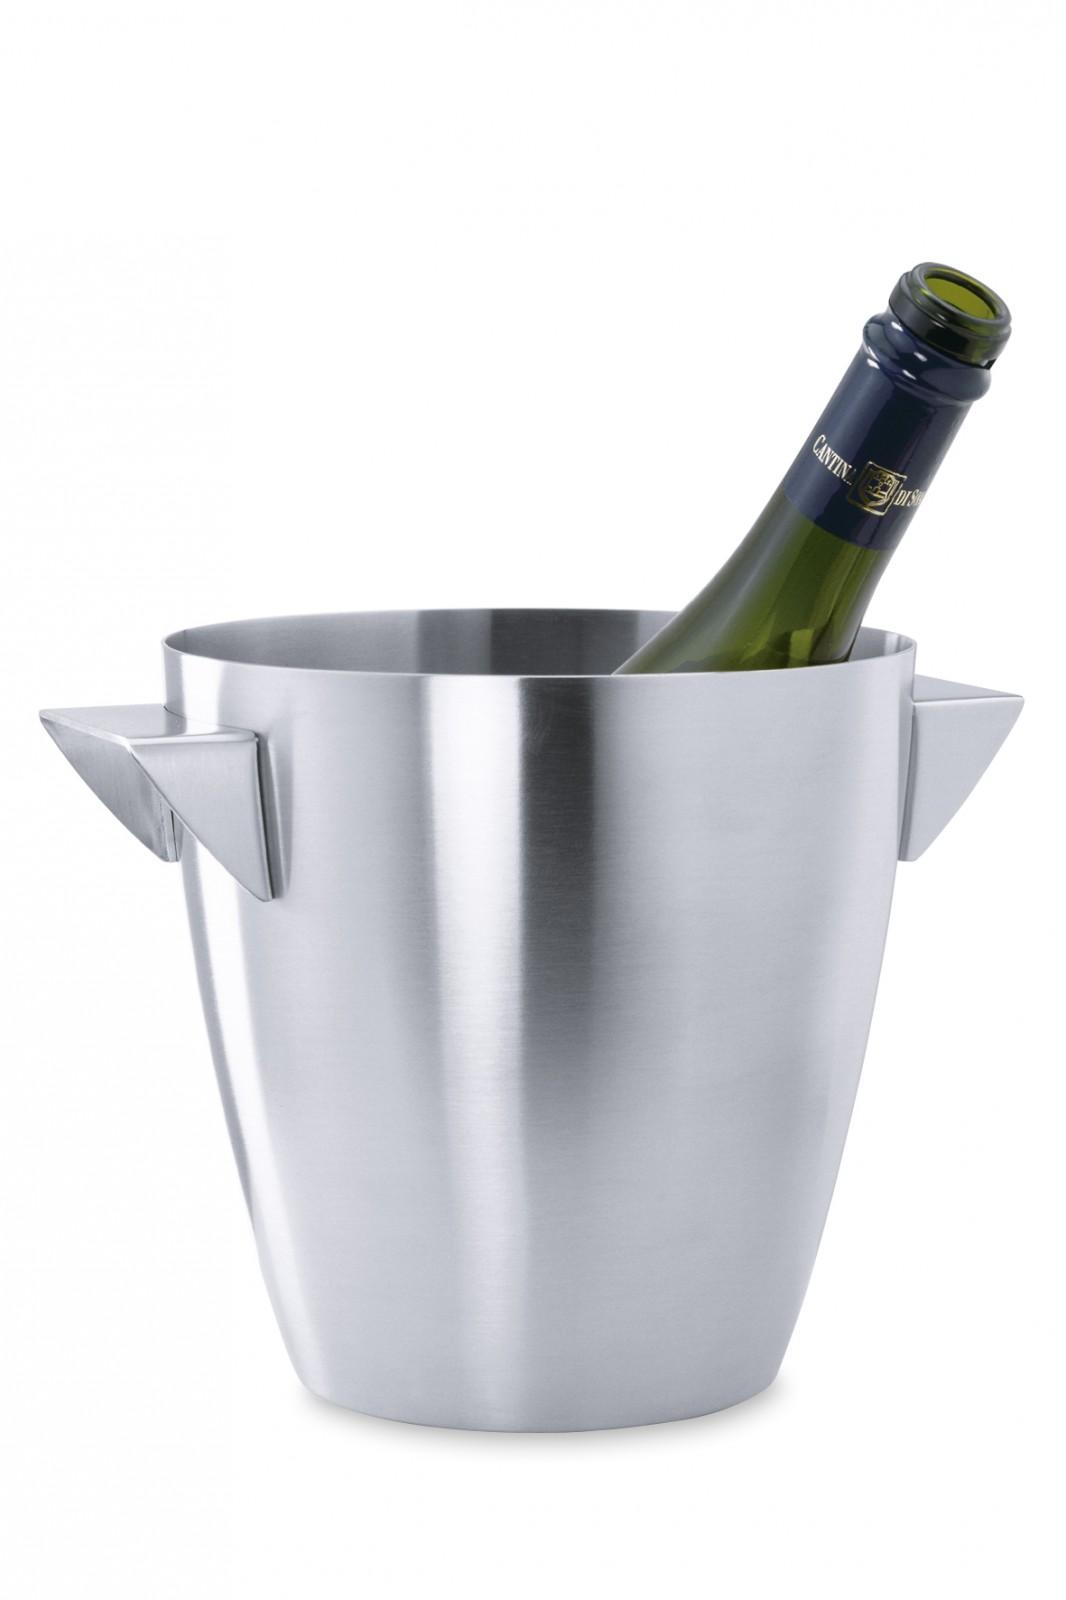 edelstahl champagnerk hler sektk hler weink hler von zack 20457 hersteller zack wohnen. Black Bedroom Furniture Sets. Home Design Ideas